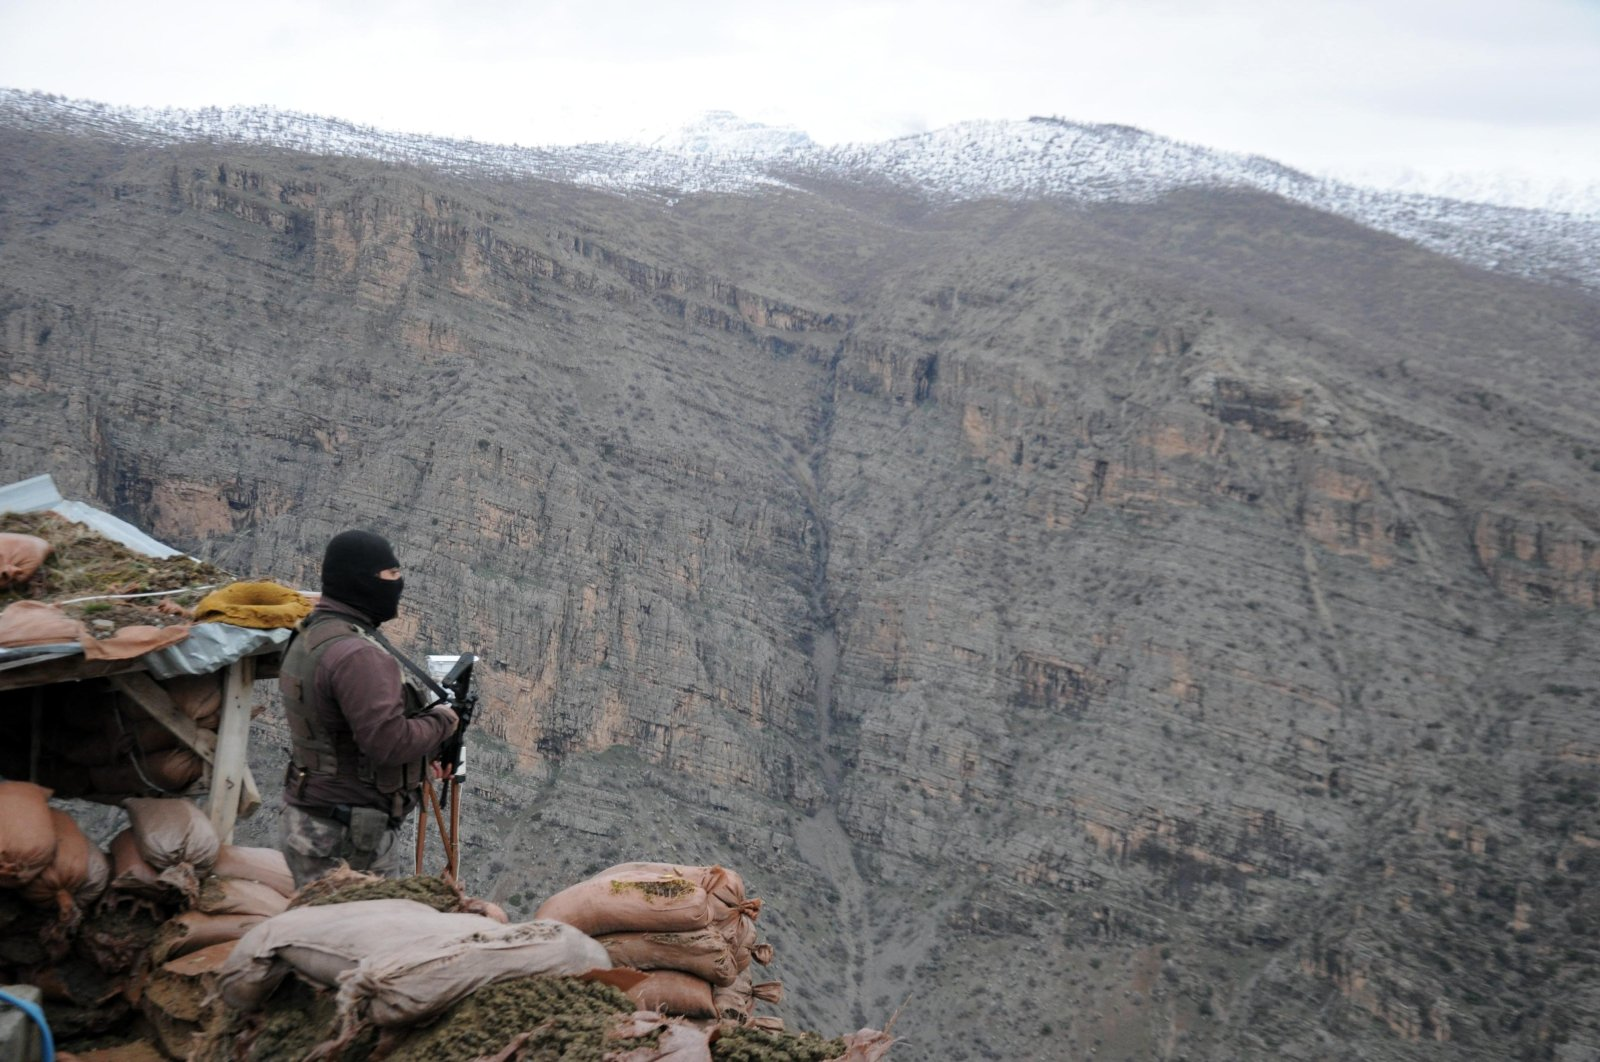 A Turkish soldier stands on guard at a base in Çukurca, Hakkari, Turkey. (AA File Photo)